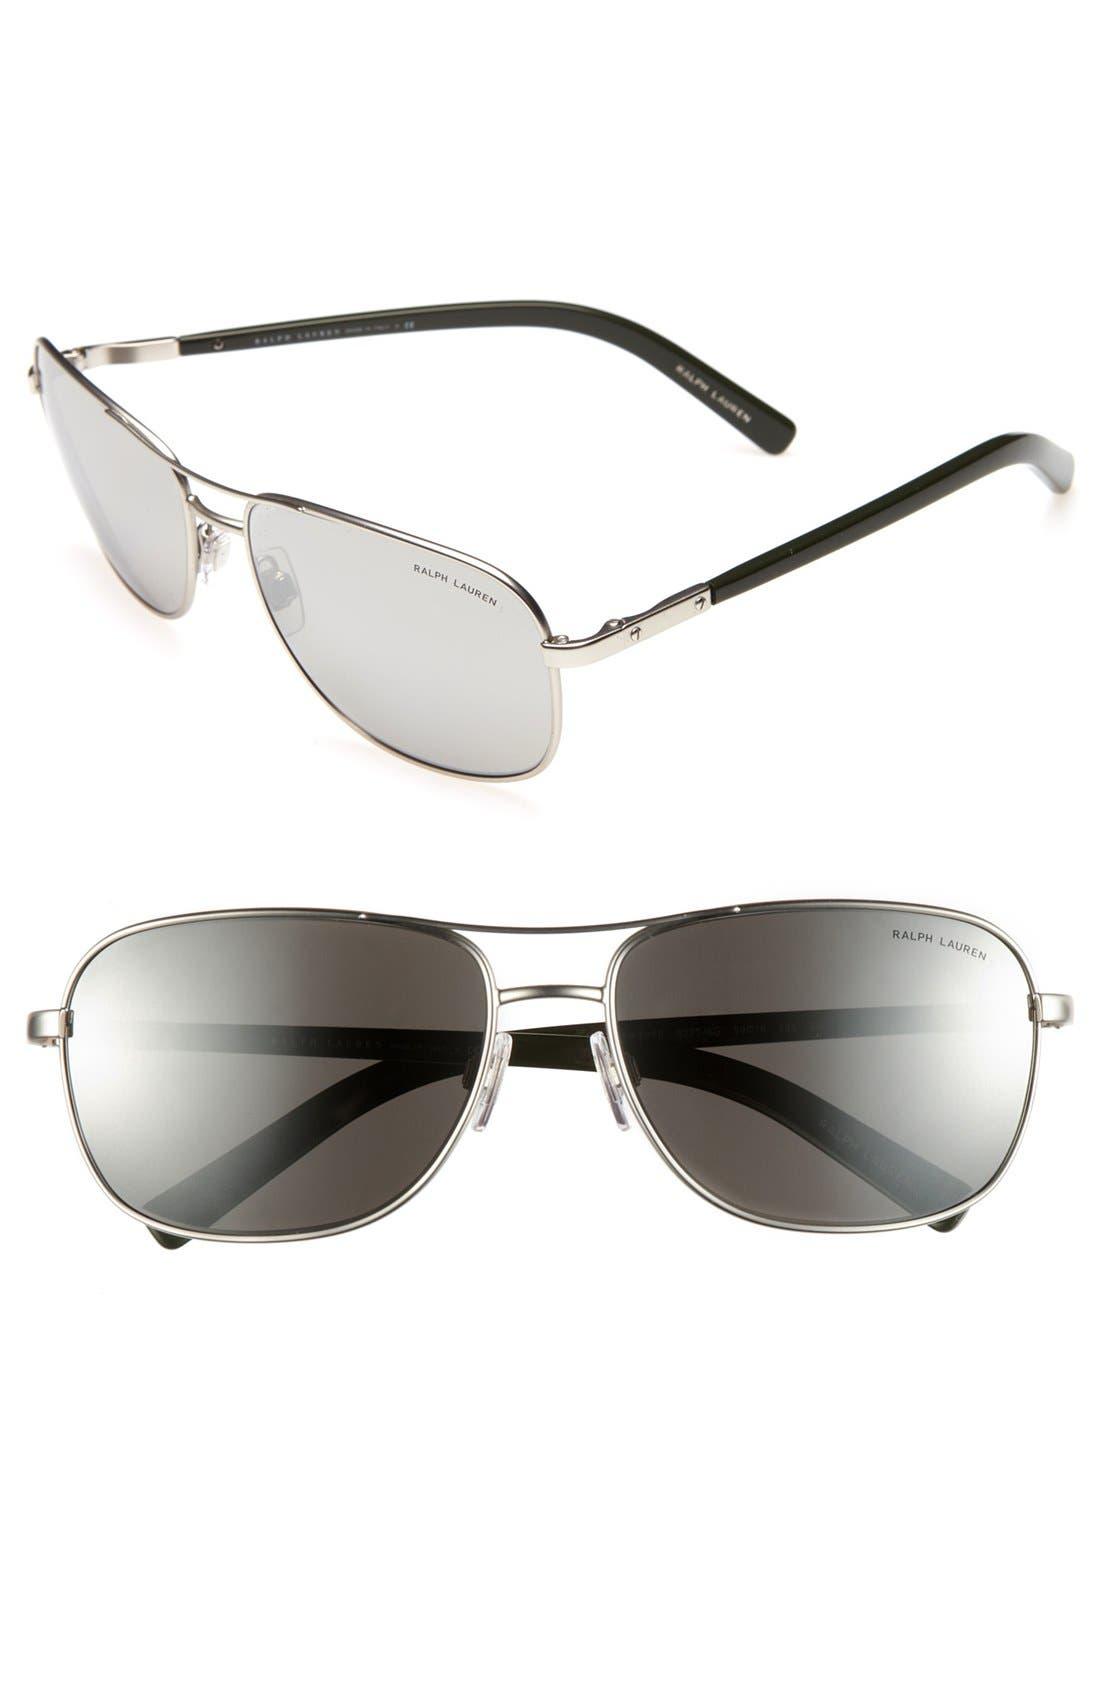 Alternate Image 1 Selected - Polo Ralph Lauren 59mm Keyhole Sunglasses